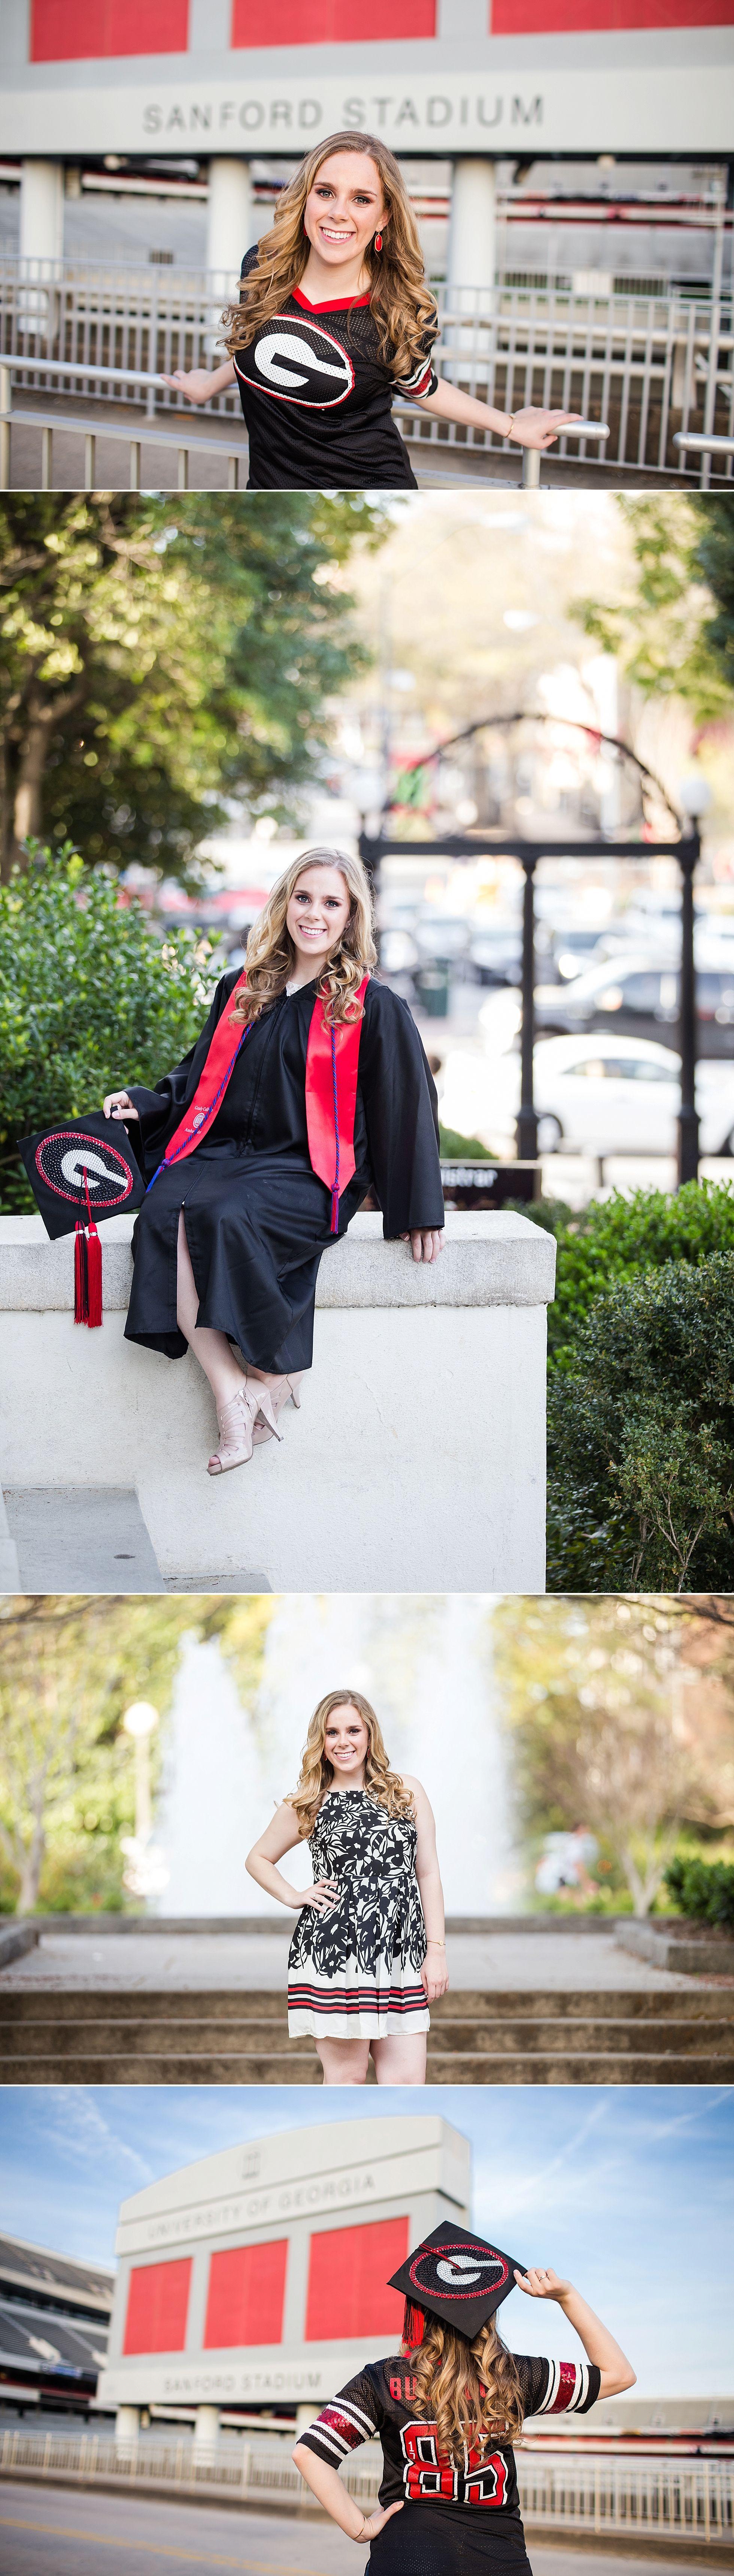 University of Georgia Graduation photos | UGA Senior session ...